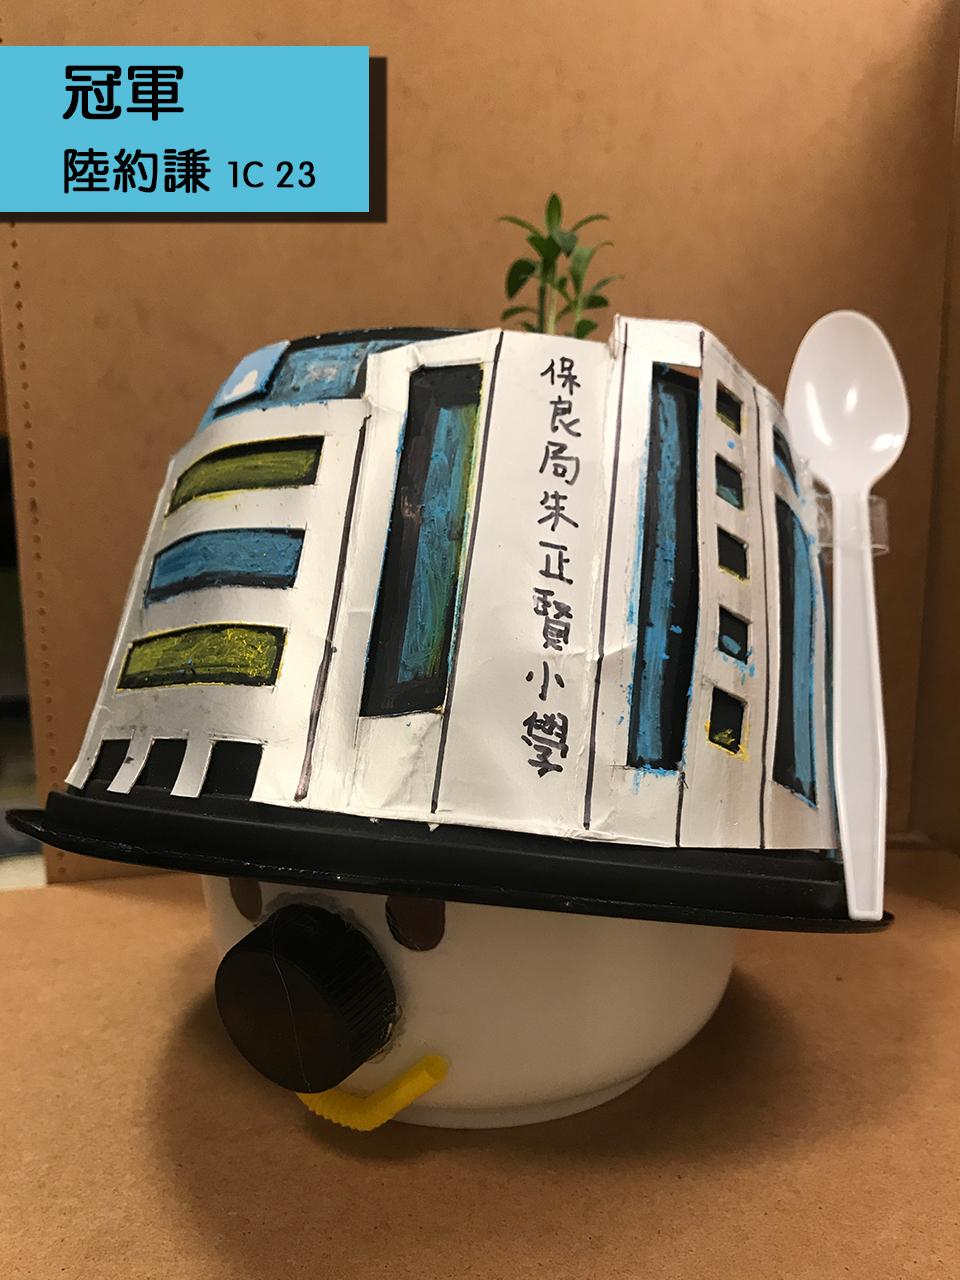 https://plkcjy.edu.hk/sites/default/files/_guan_jun_1c_23_lu_yue_qian_.jpg